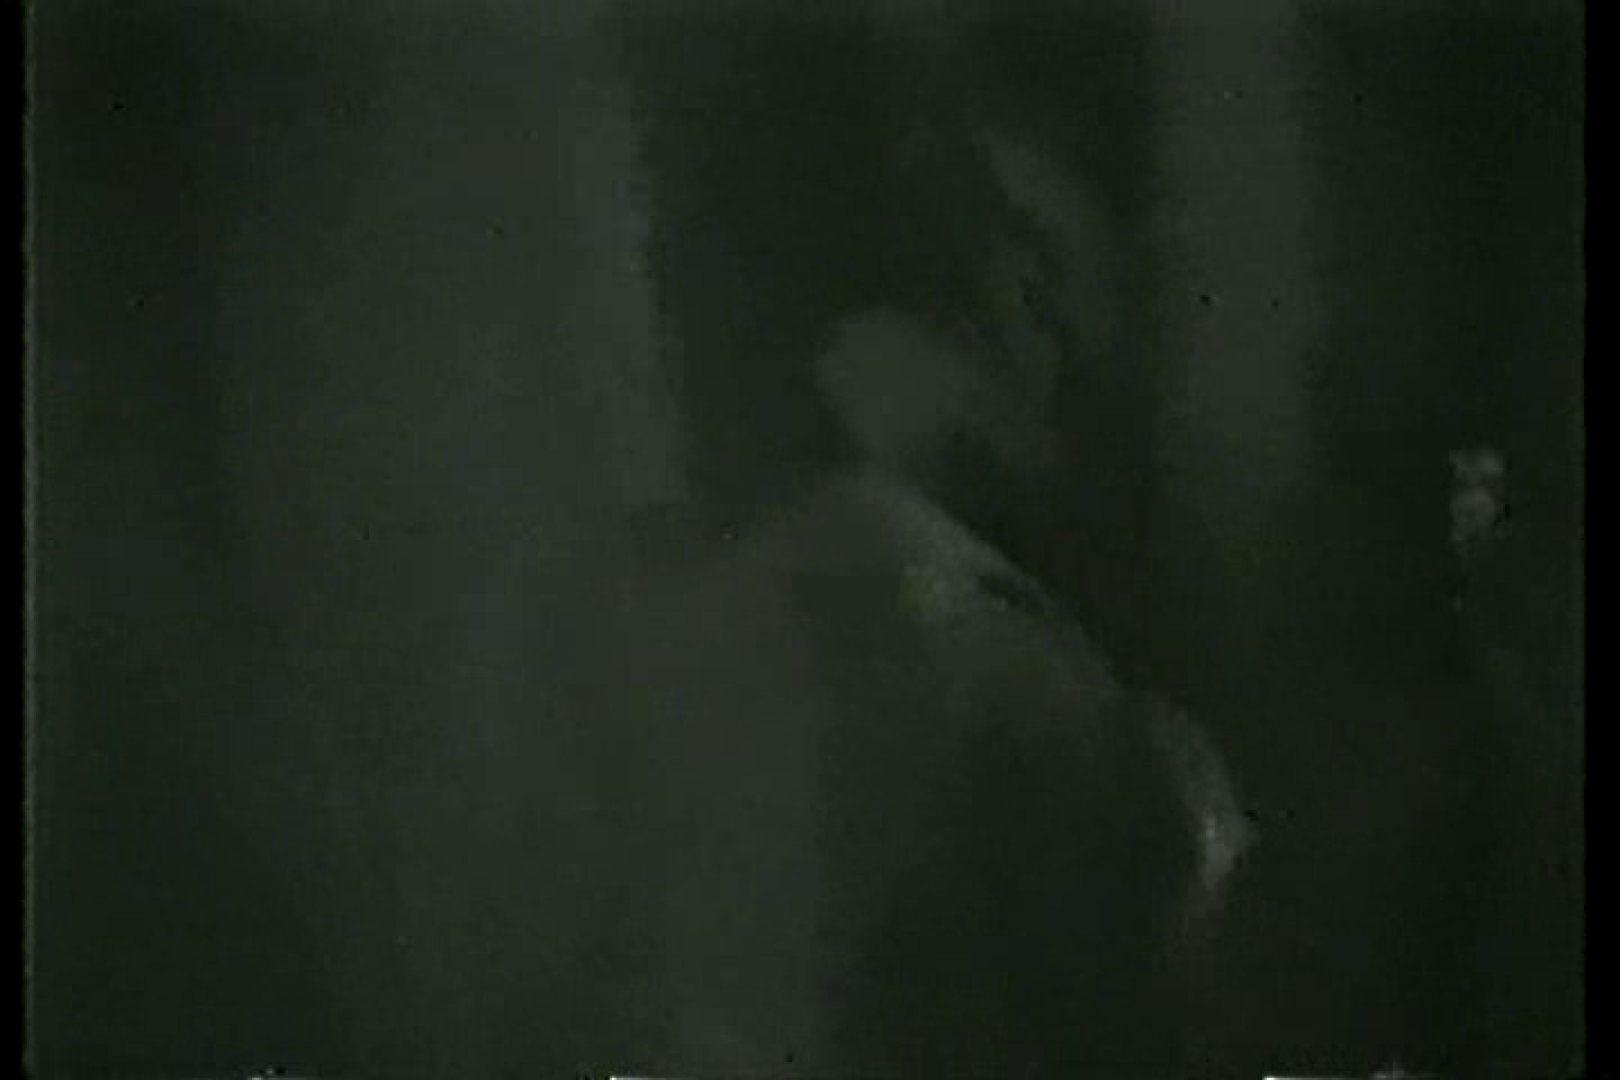 深夜の撮影会Vol.6 覗き 濡れ場動画紹介 109PIX 29